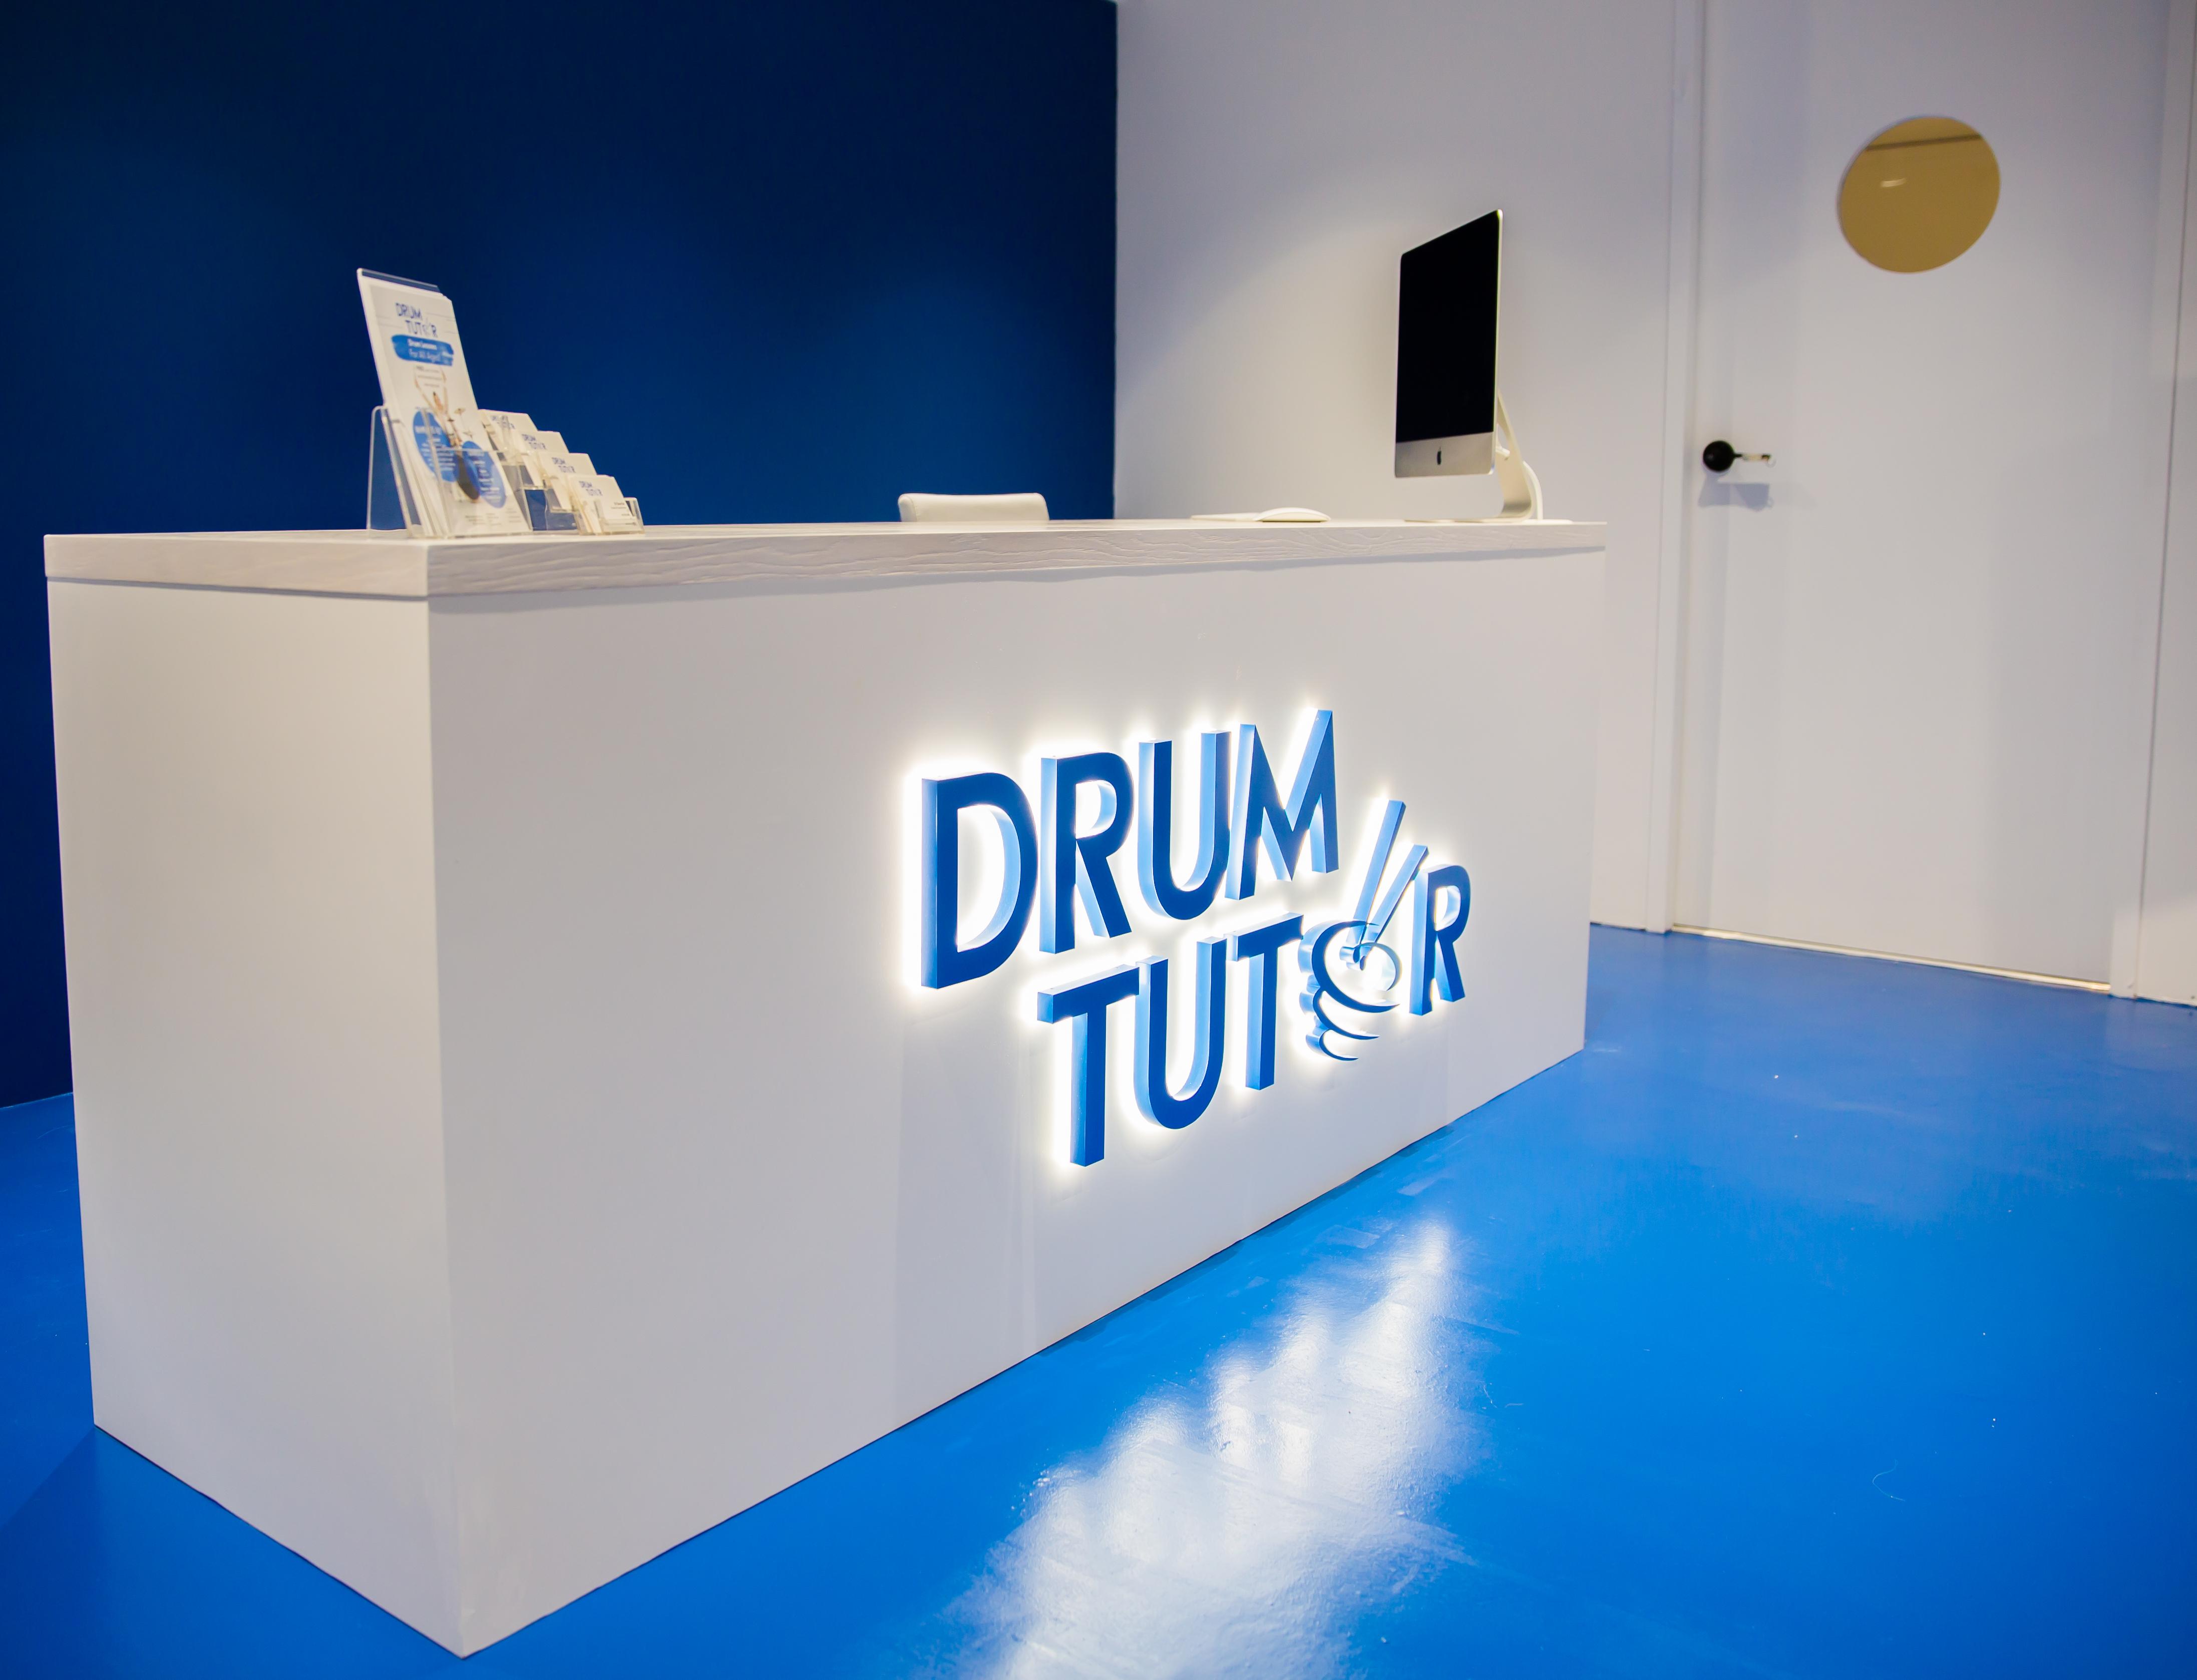 Drum Tutor Reception Area